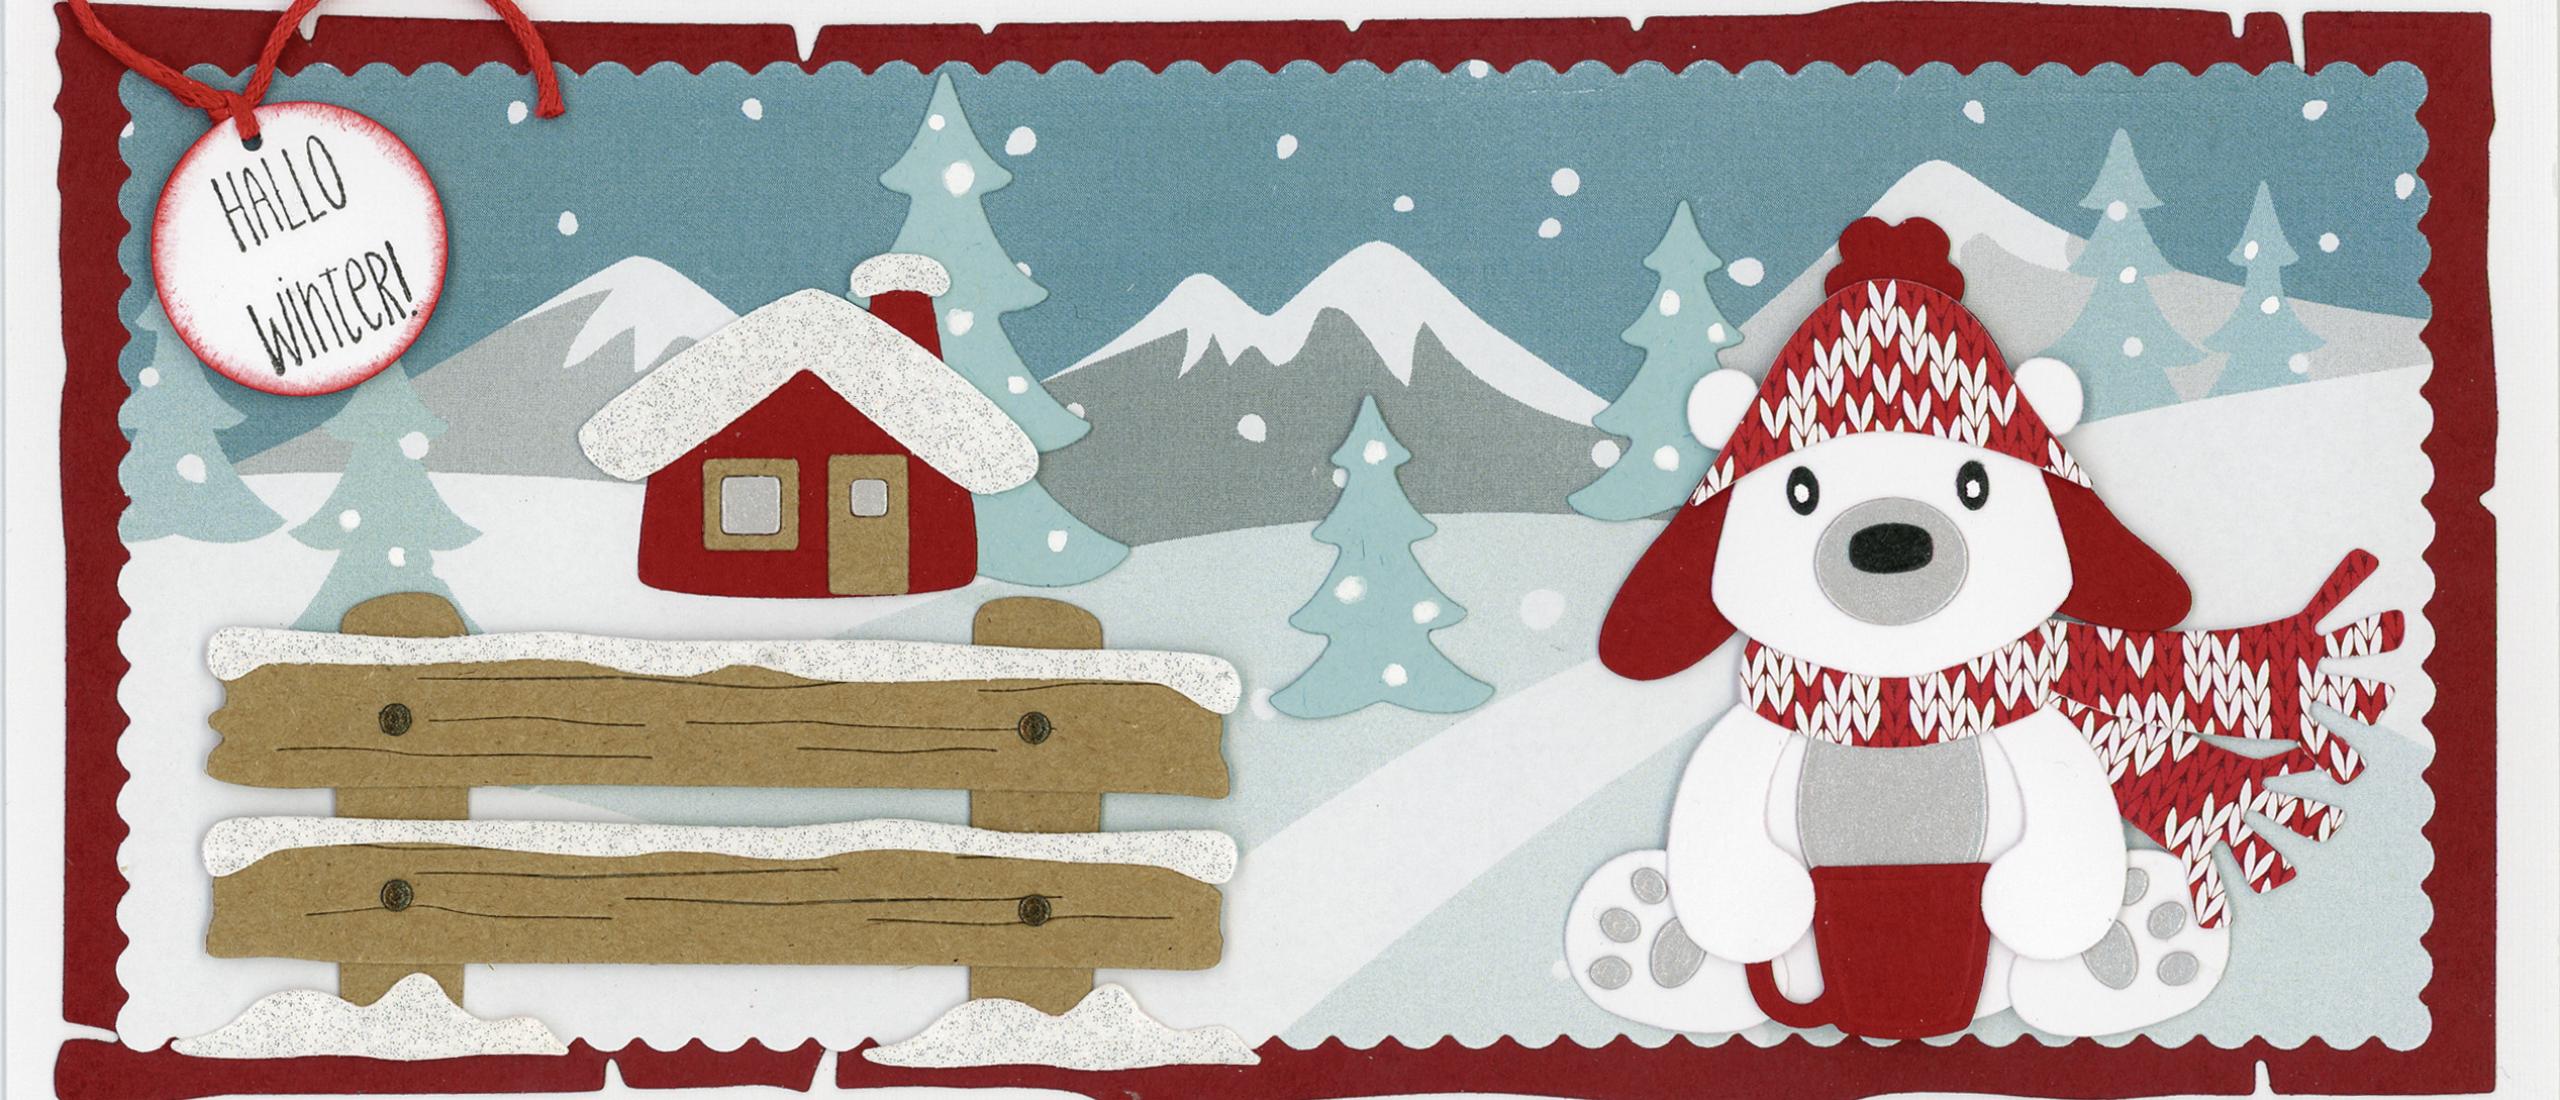 Hallo Winter - Marianne Design in Hobbyjournaal 199